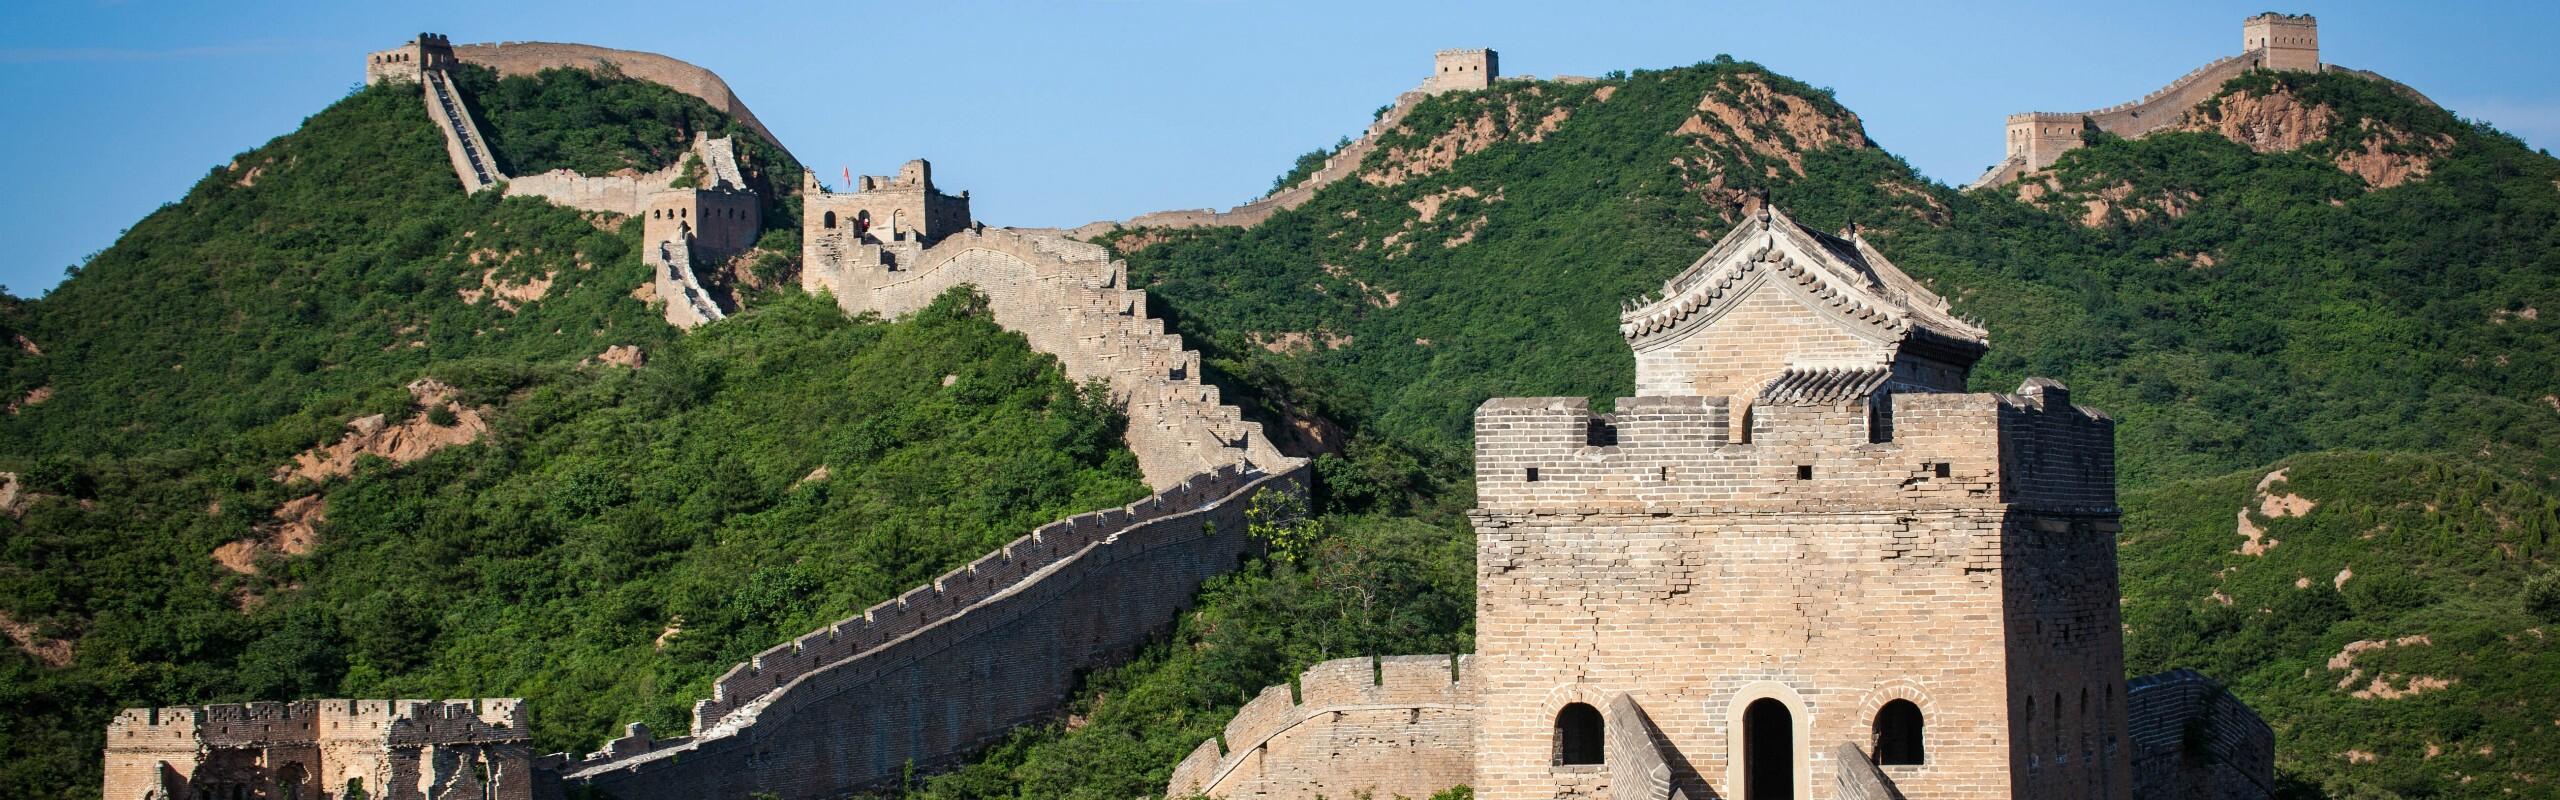 One Day Jinshanling Great Wall Hiking Tour